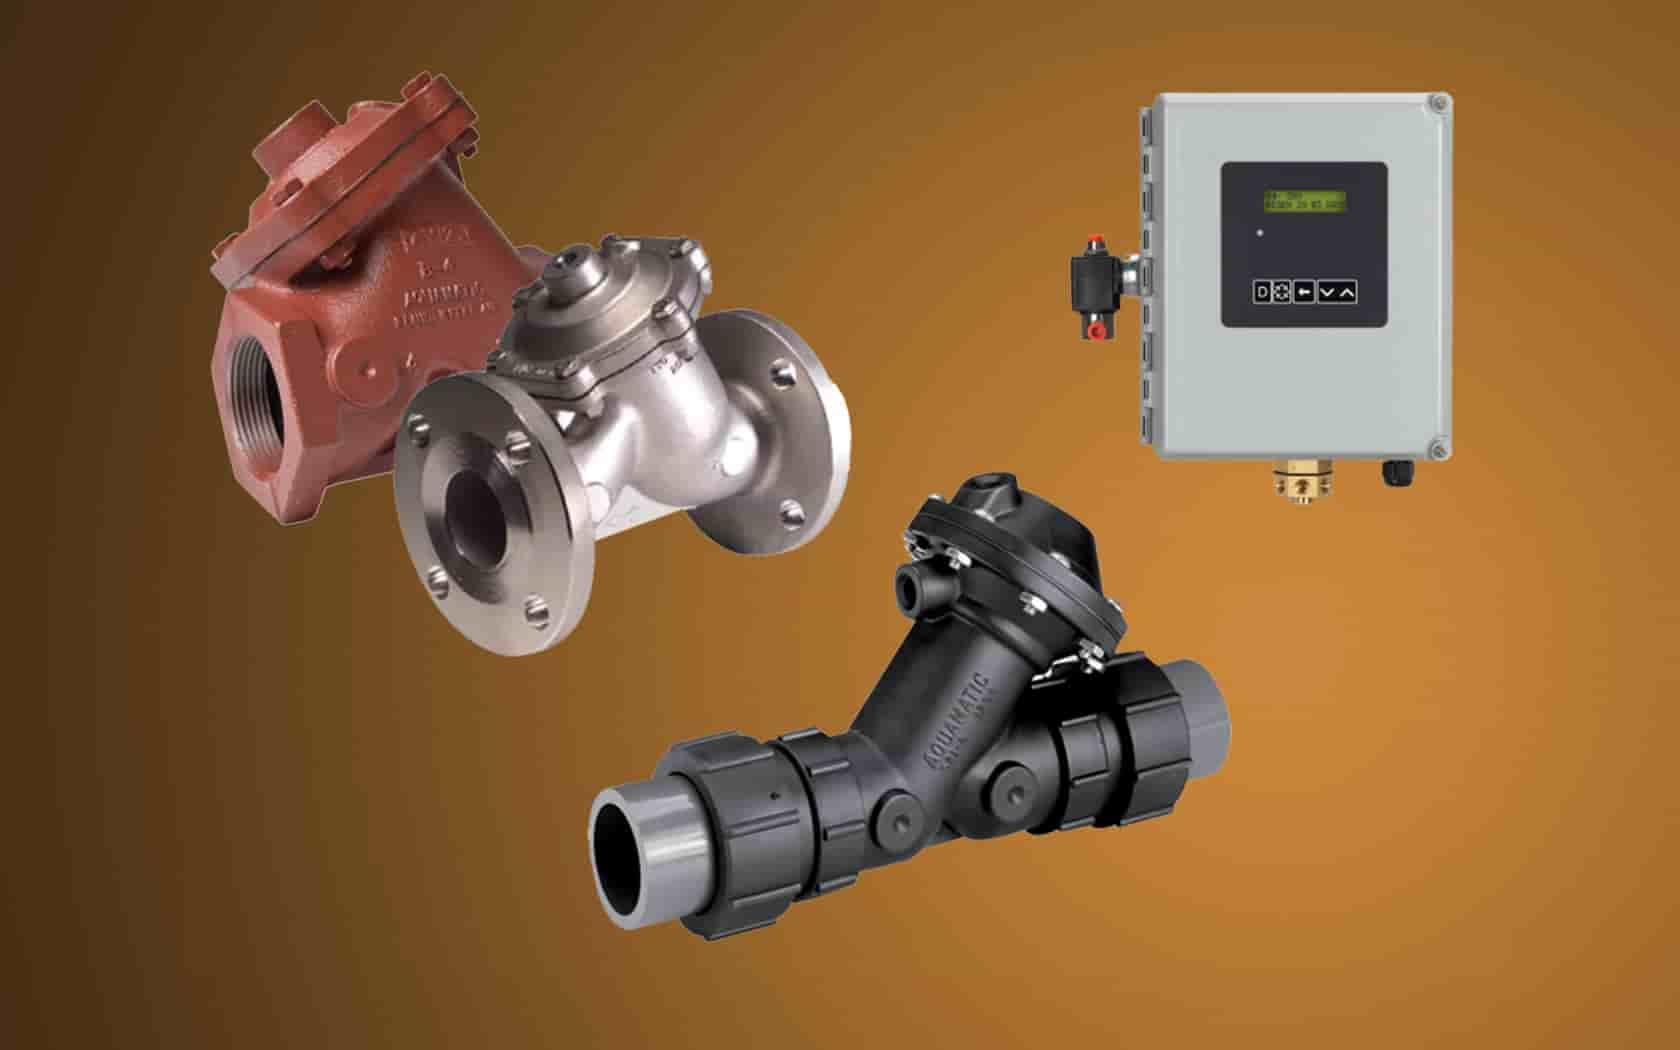 http://siata.com.sg/wp-content/uploads/2017/03/siata-aquamatic-diaphragm-valves-eductors-min.jpg